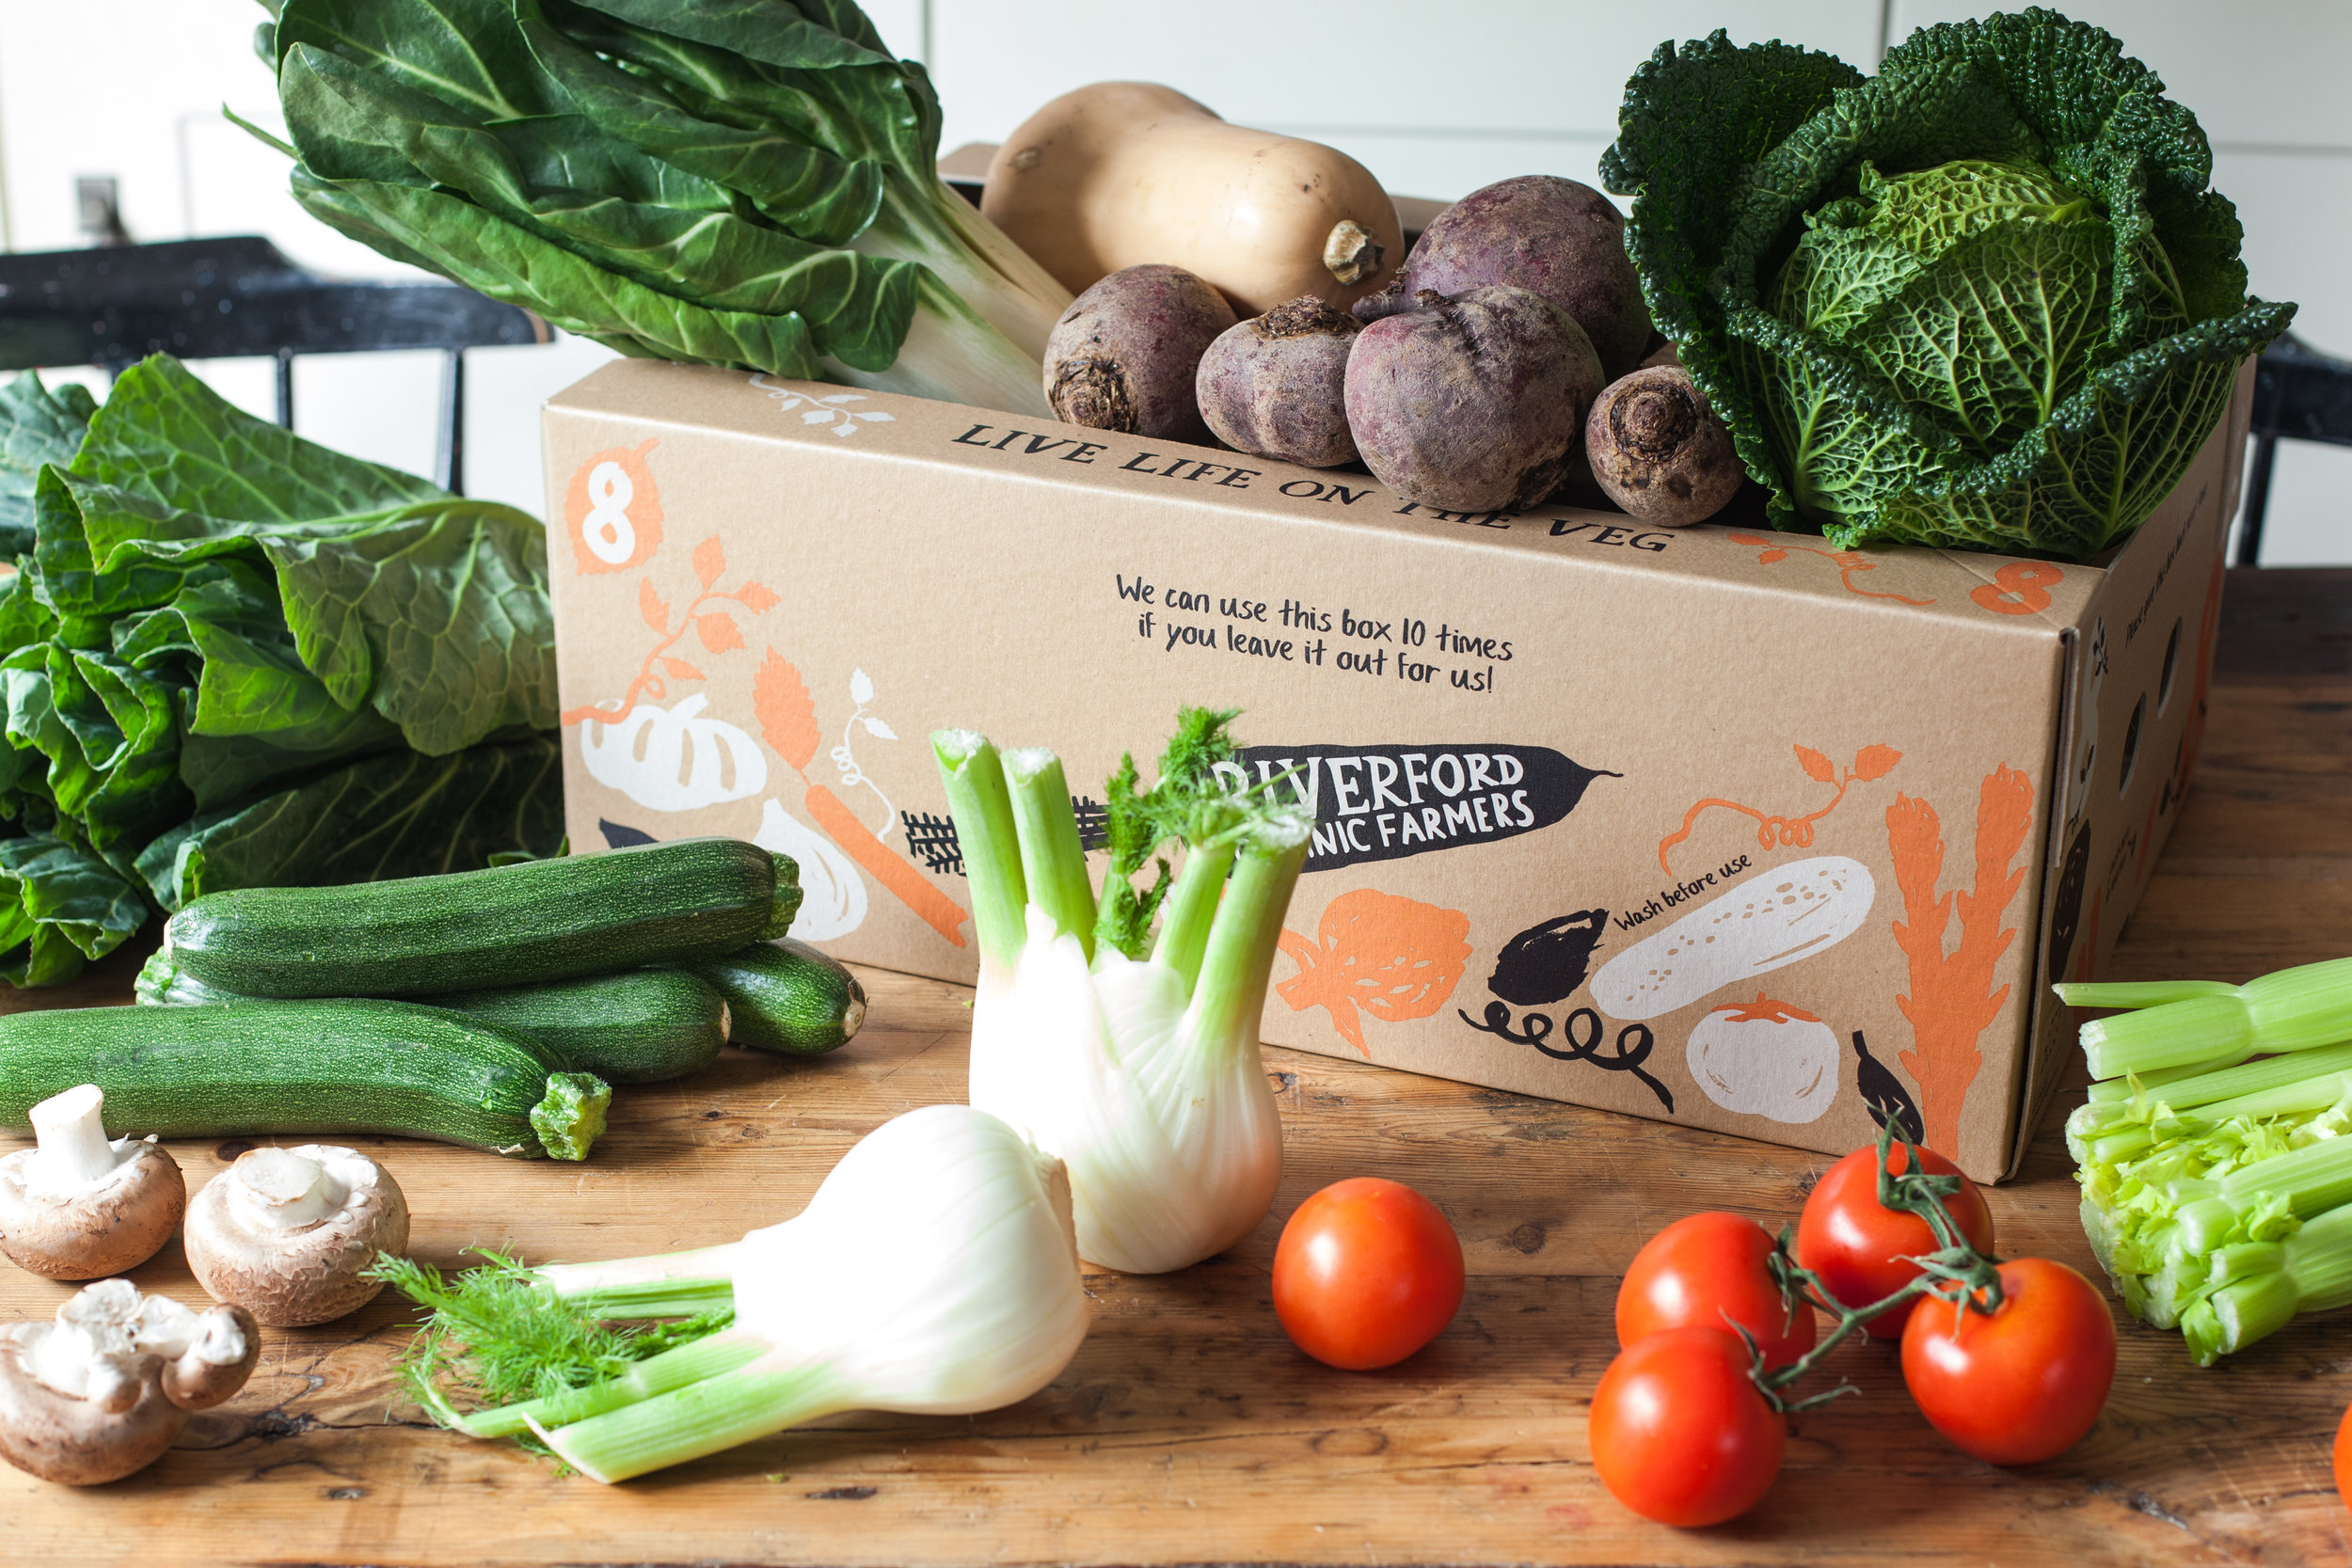 riverford-veg-support-local-magazine-kent.jpg-00.jpg